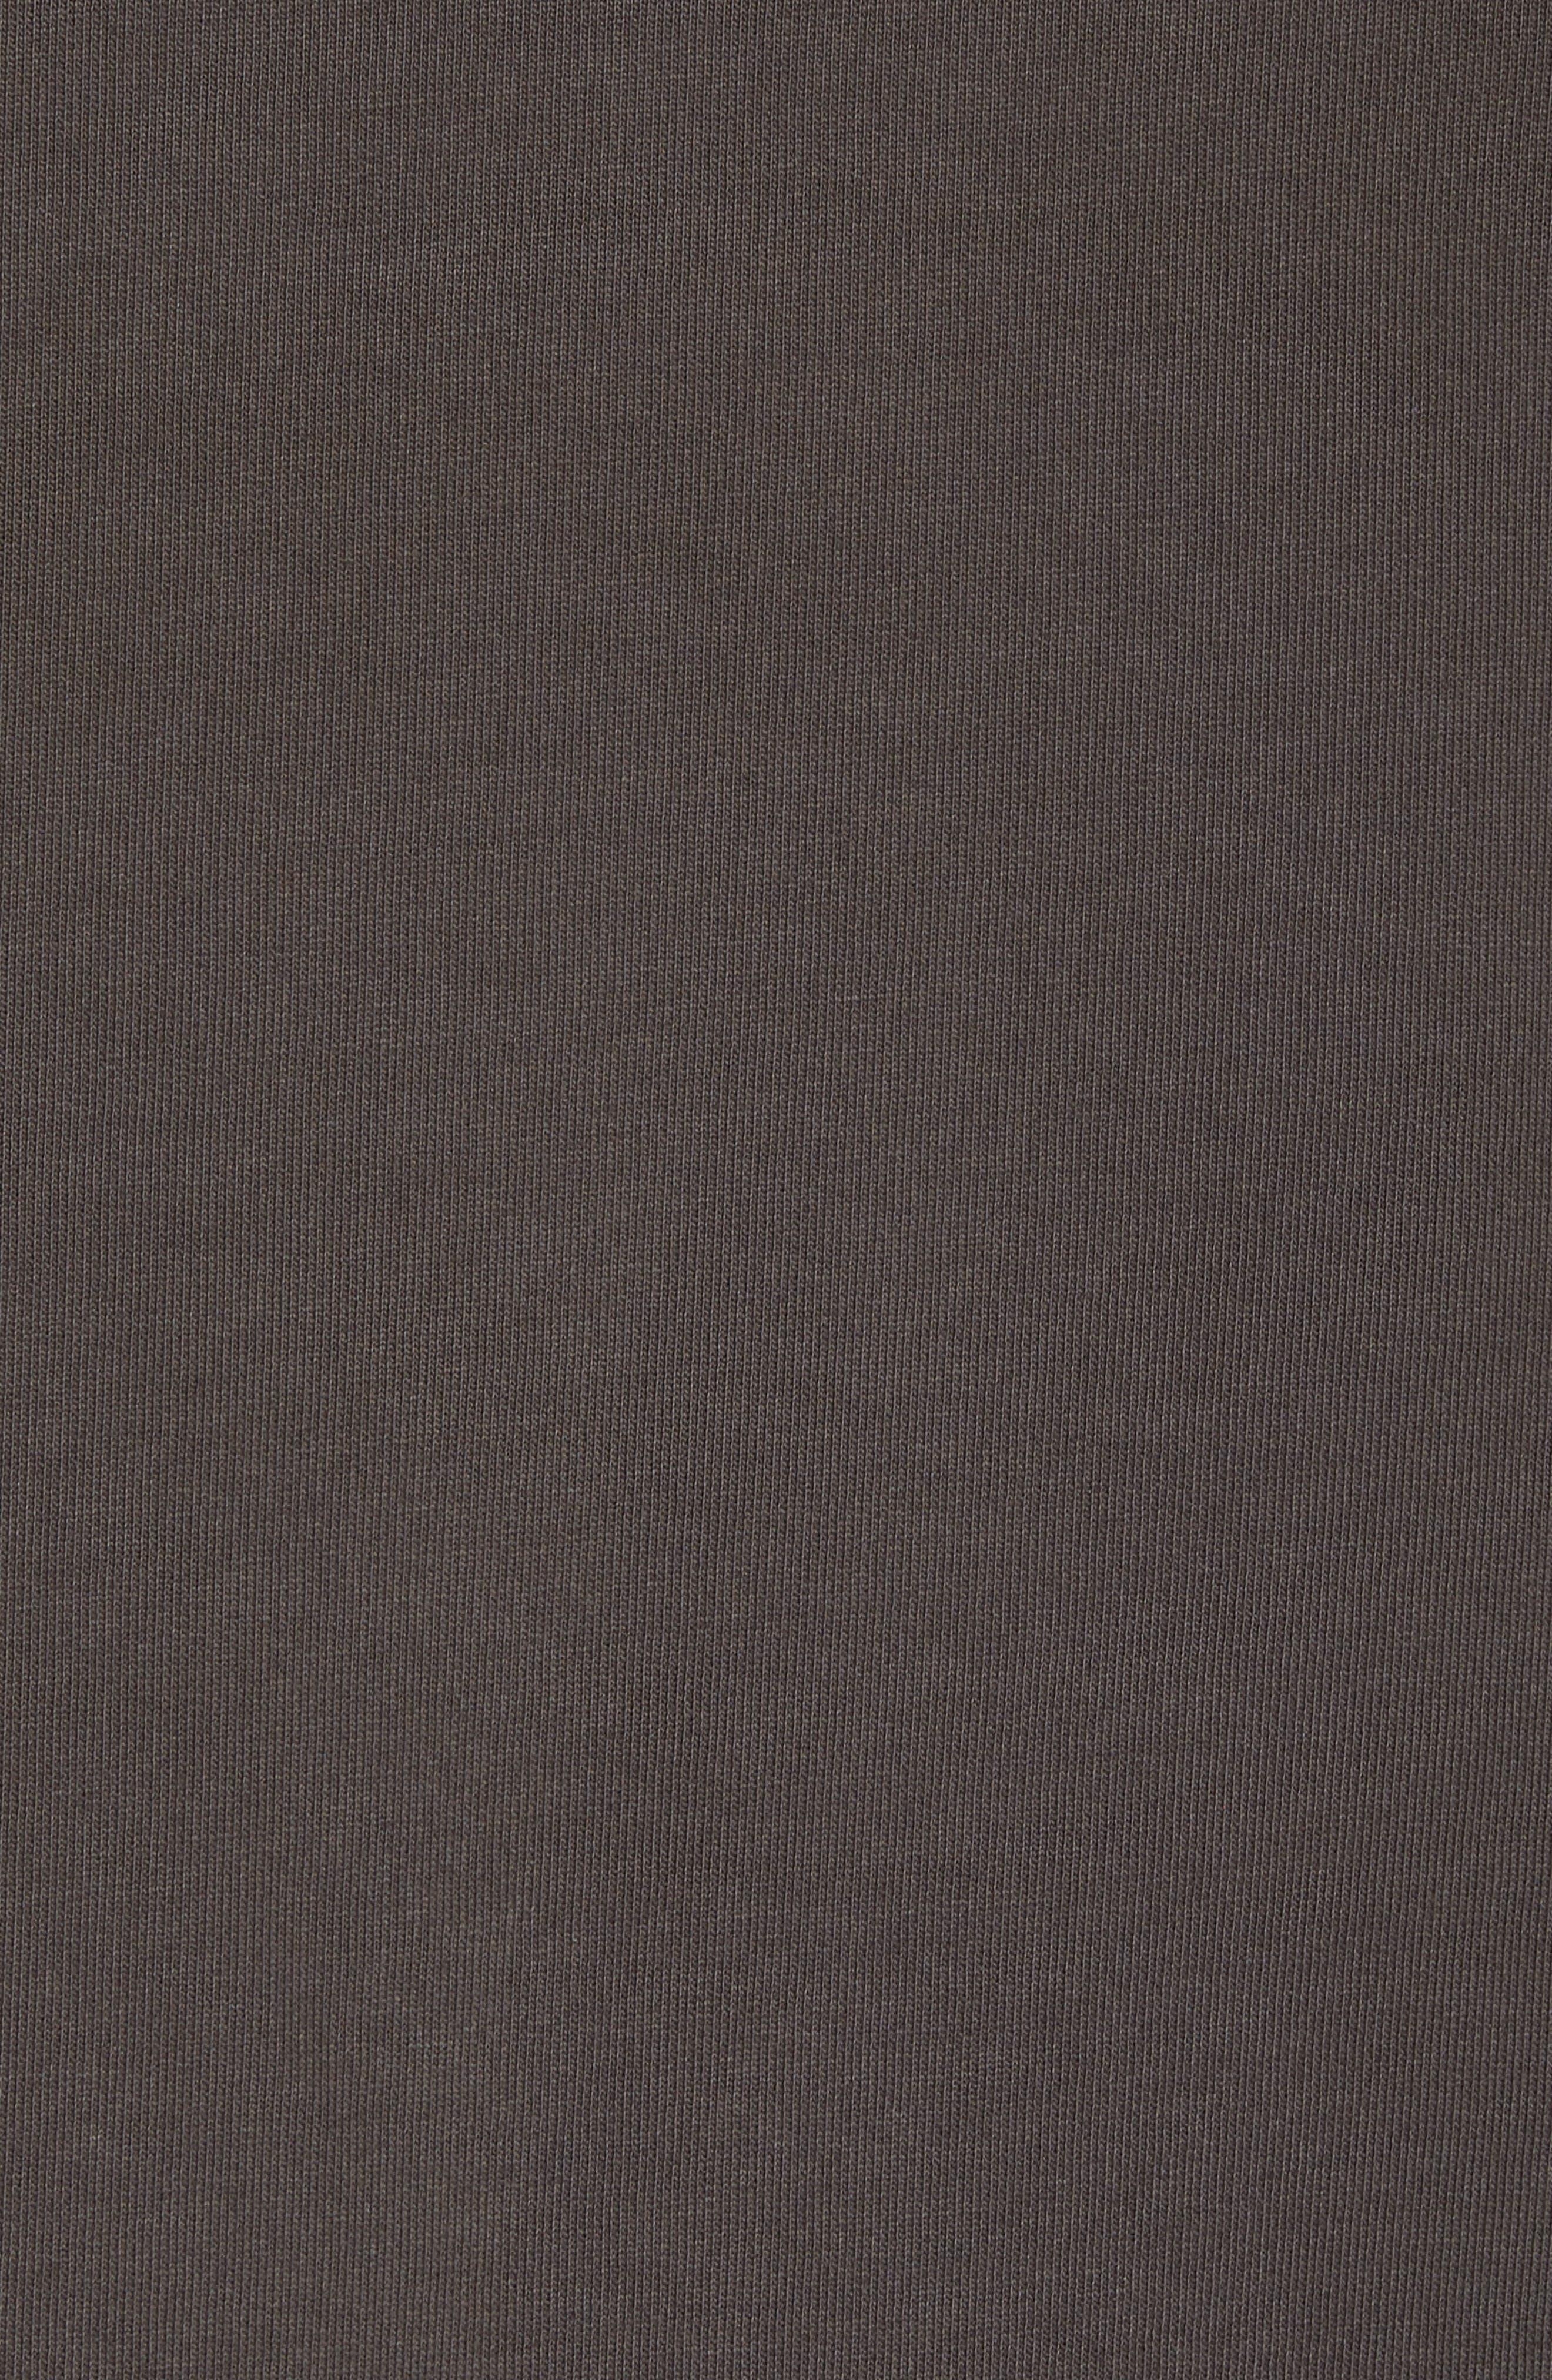 Trevor Slim Fit Crewneck Shirt,                             Alternate thumbnail 5, color,                             Smoke Grey